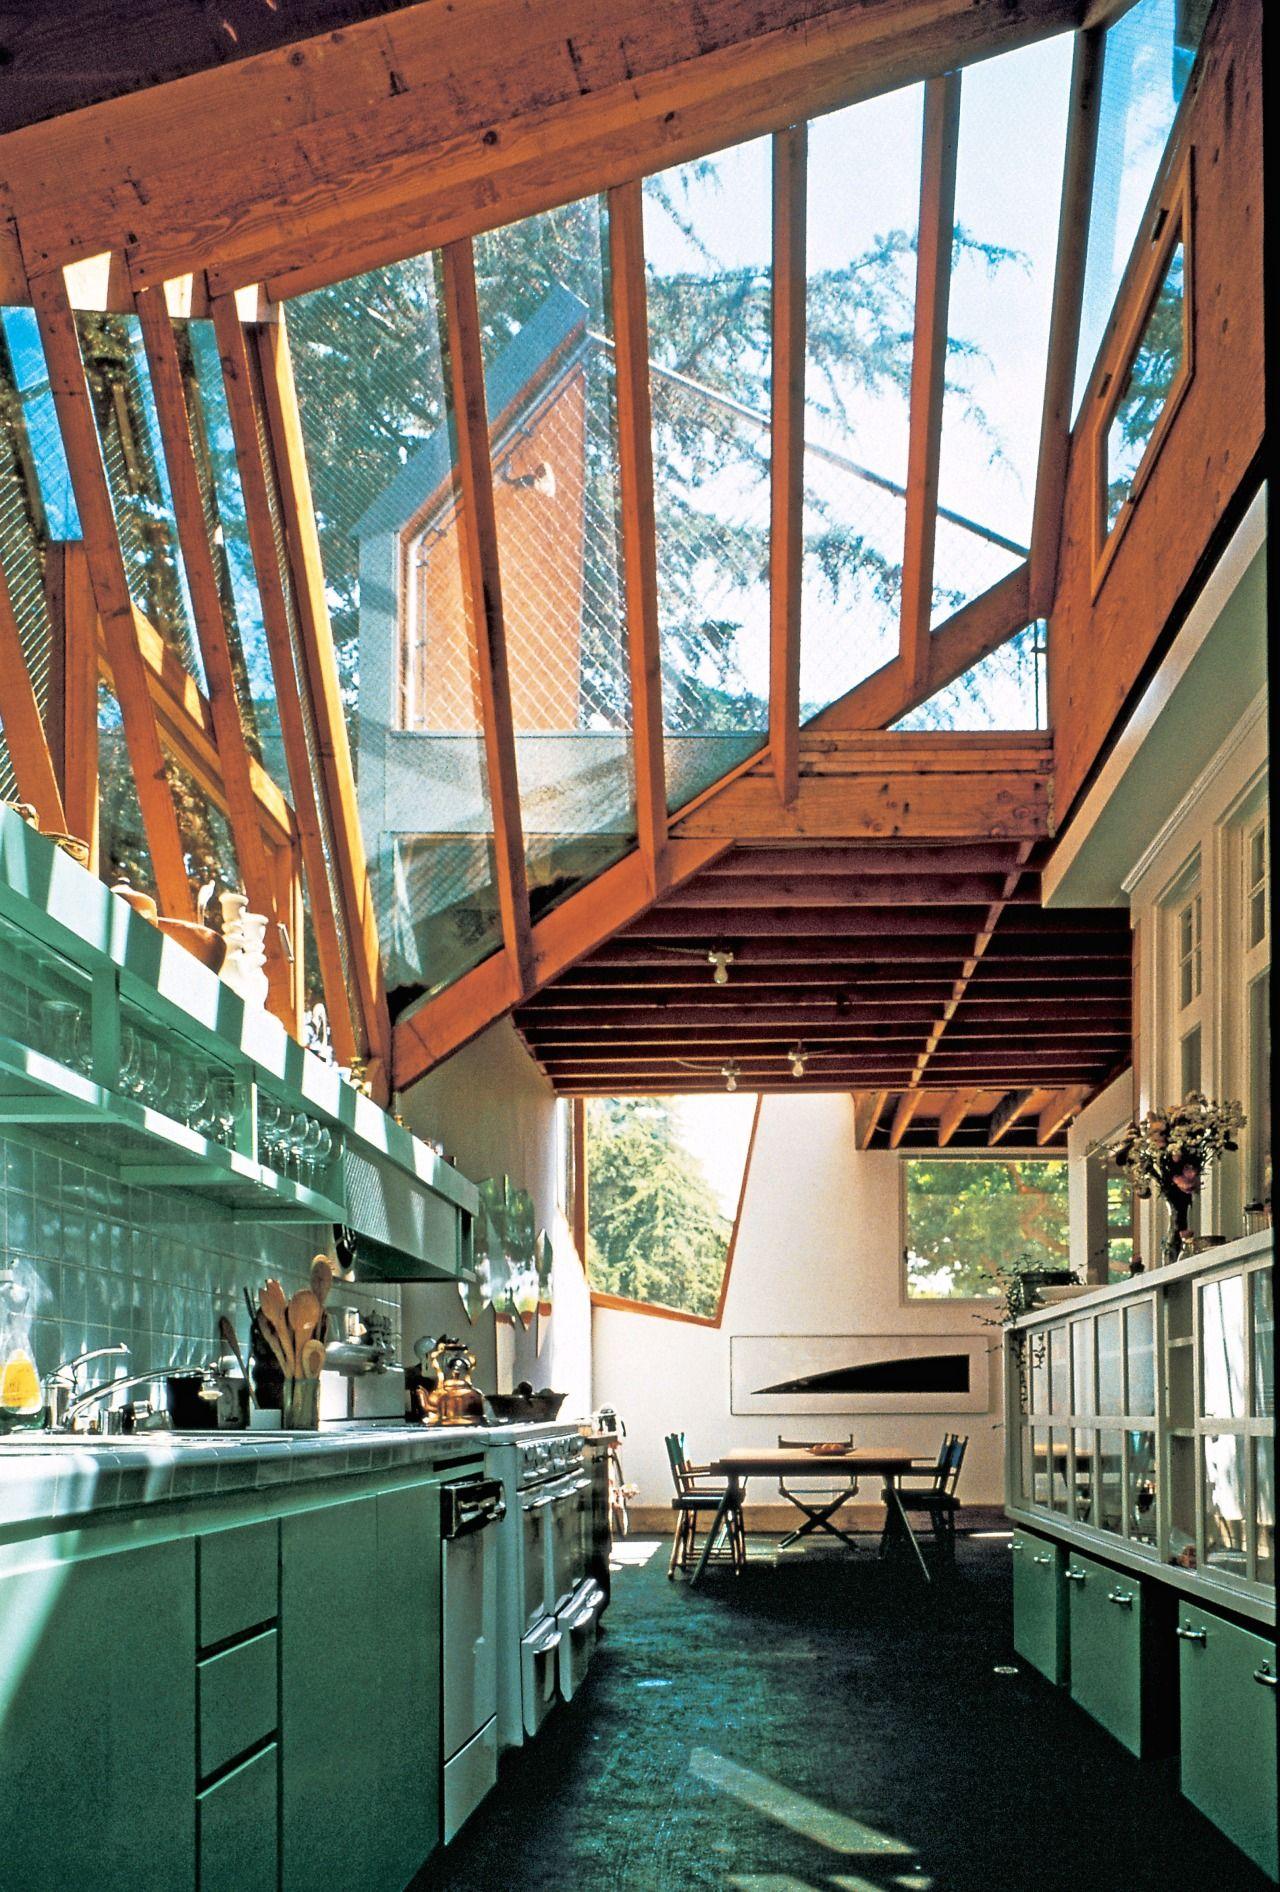 Gehry house santa monica 1978 kitchen - Santa monica interior design firms ...